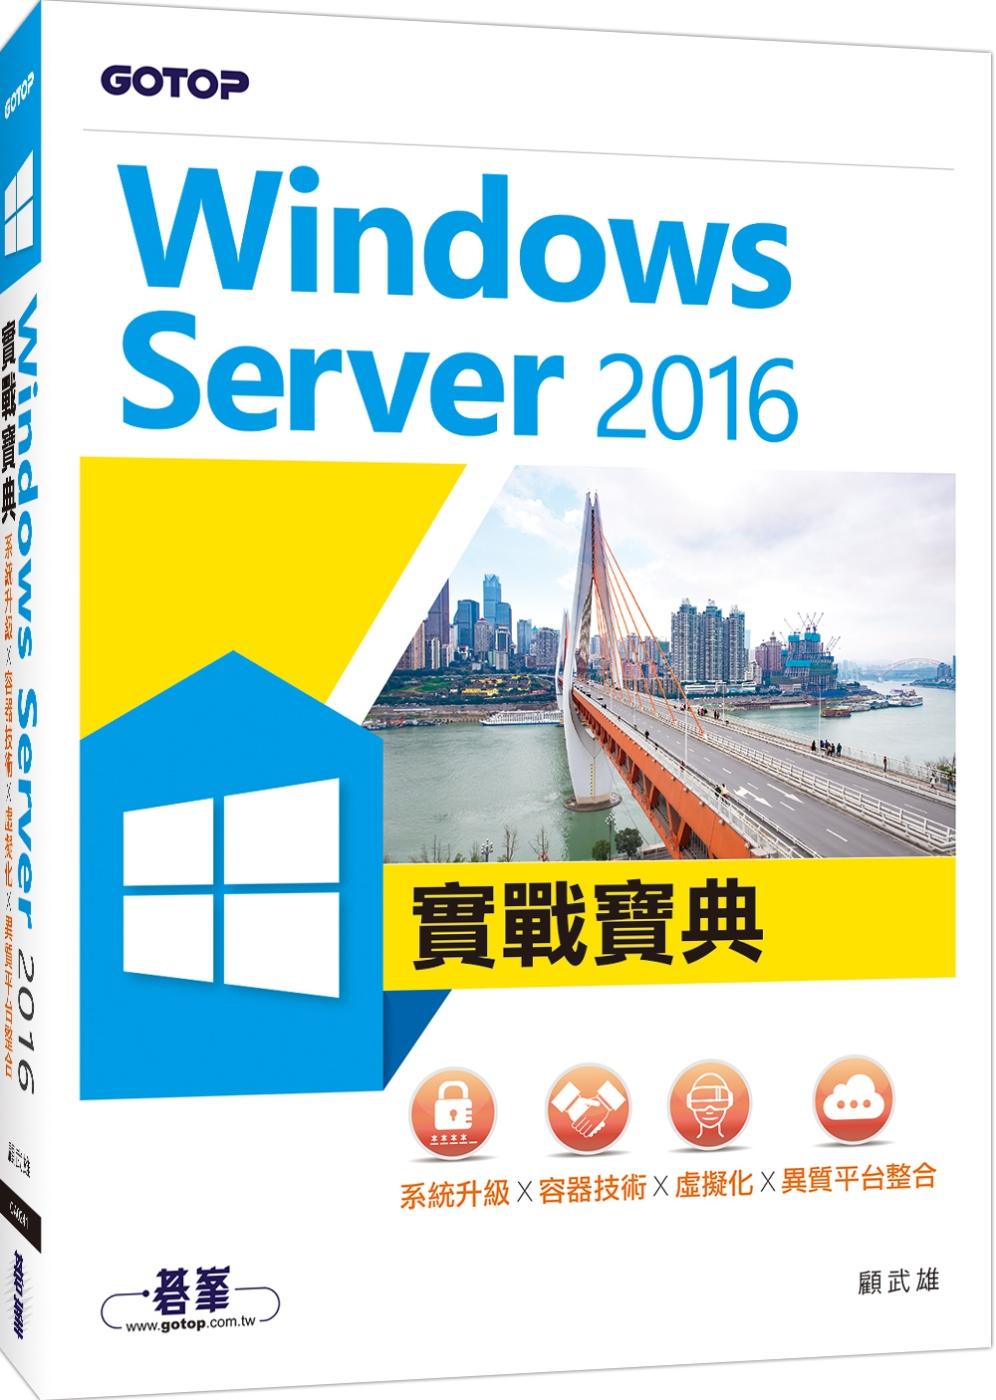 Windows Server 2016實戰寶典:系統升級x容器技術x虛擬化x異質平台整合